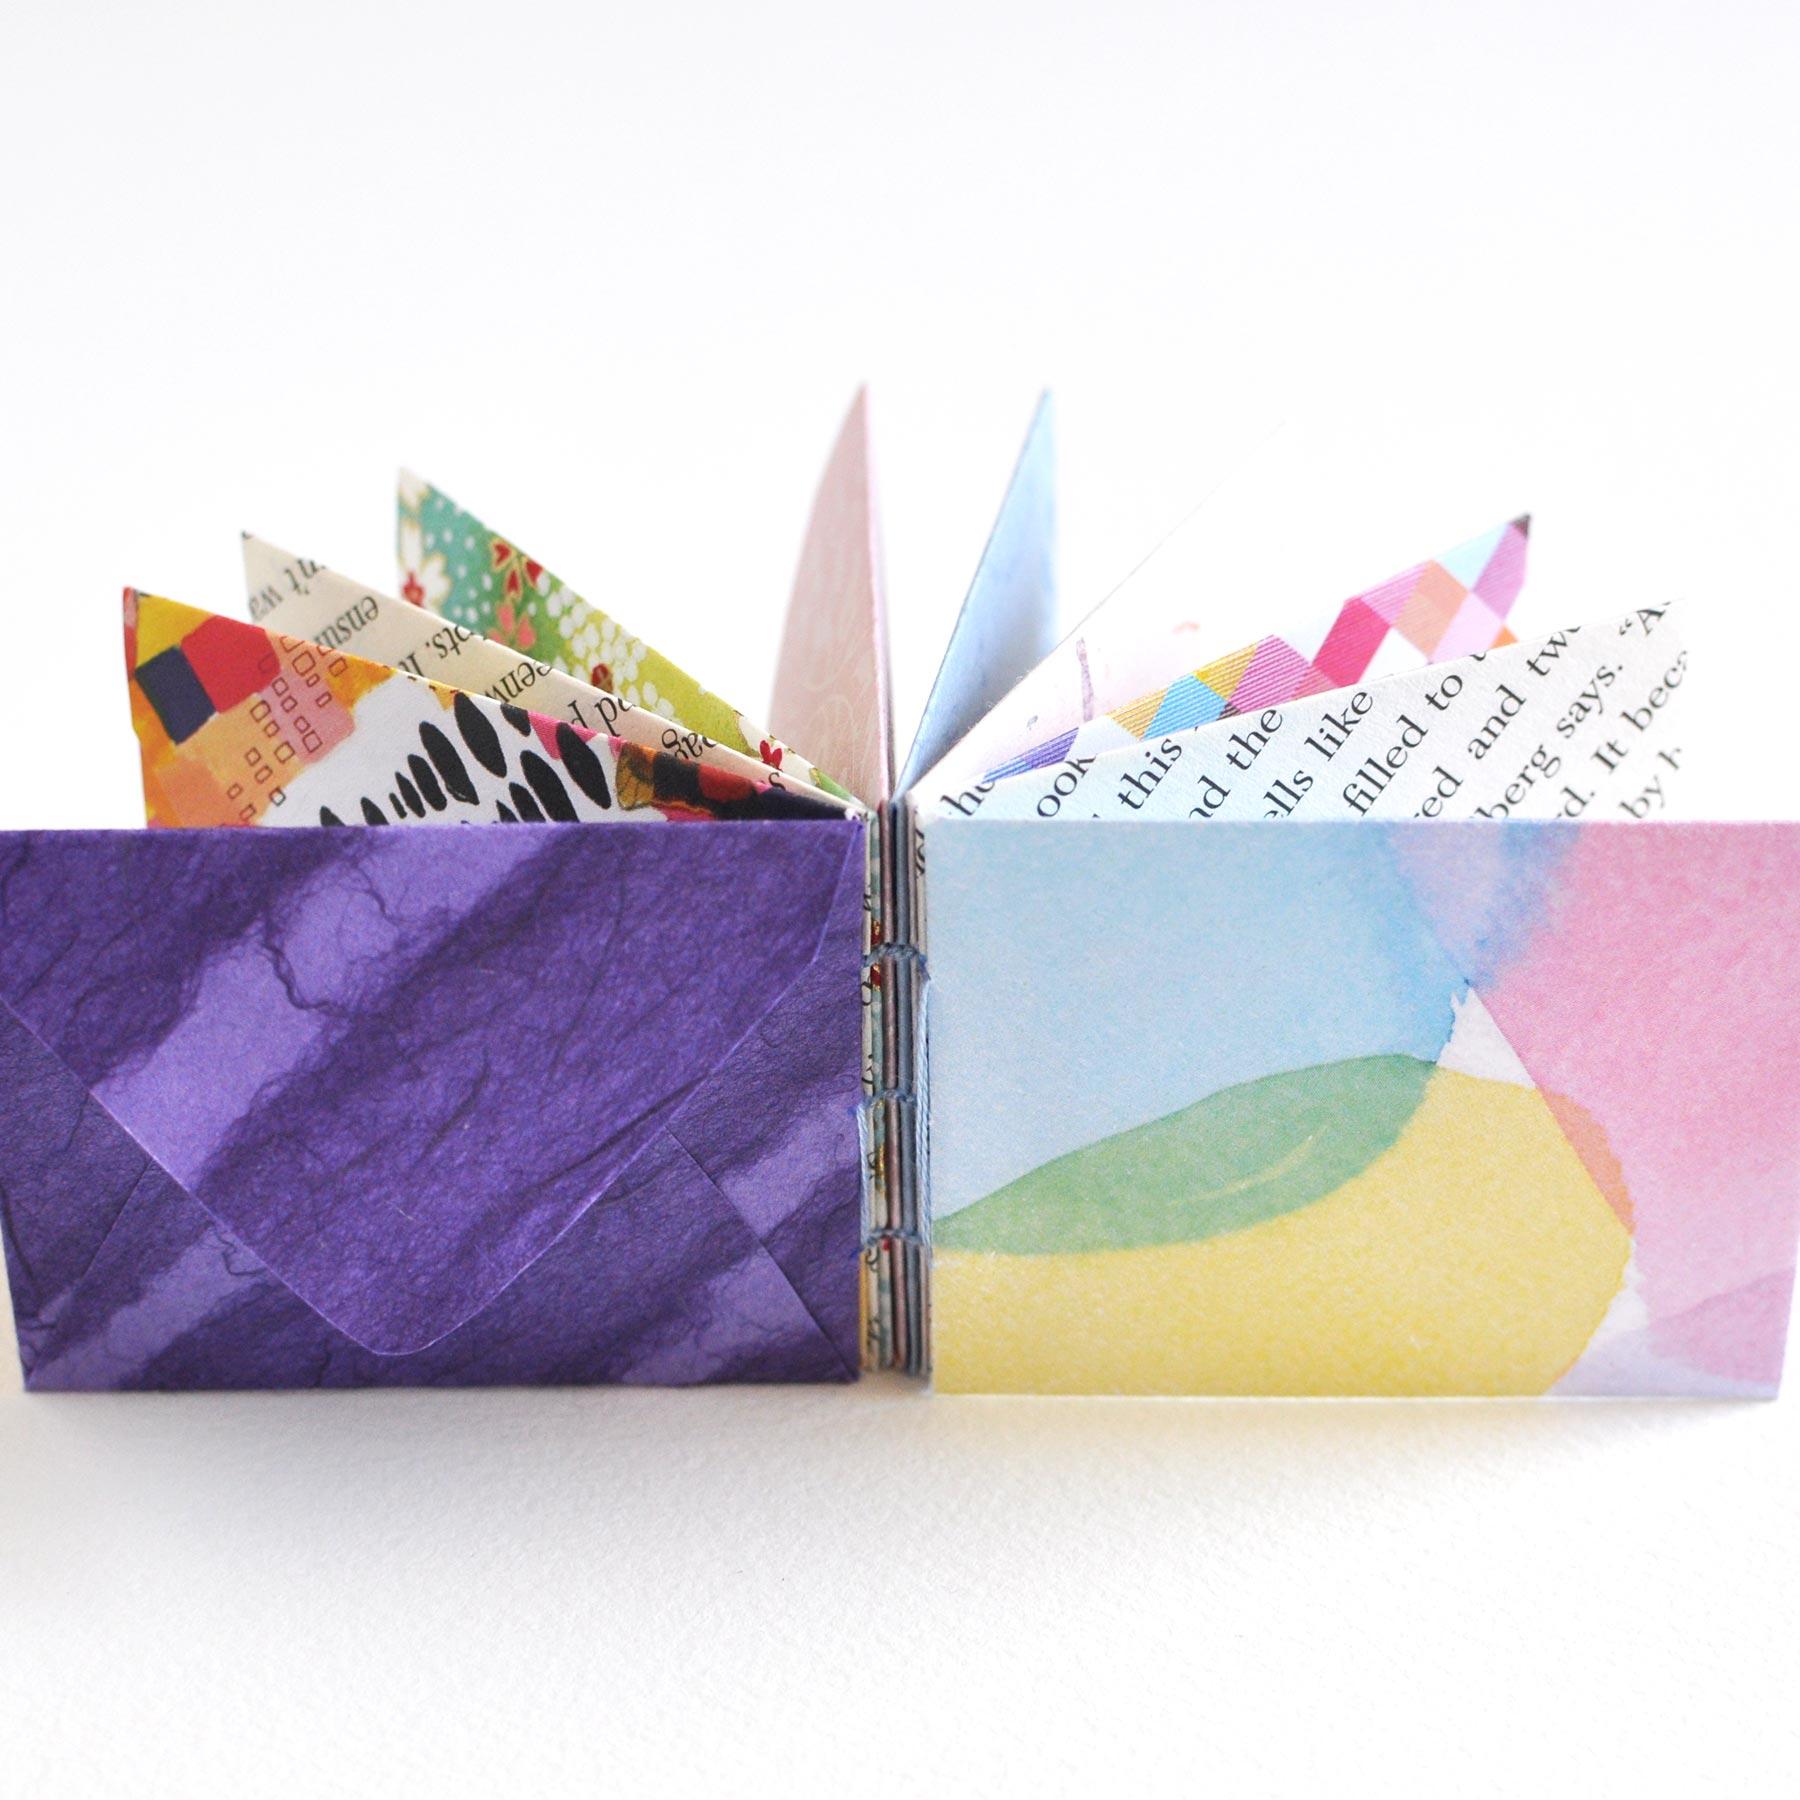 Envelope-Journal-Image-8.jpg